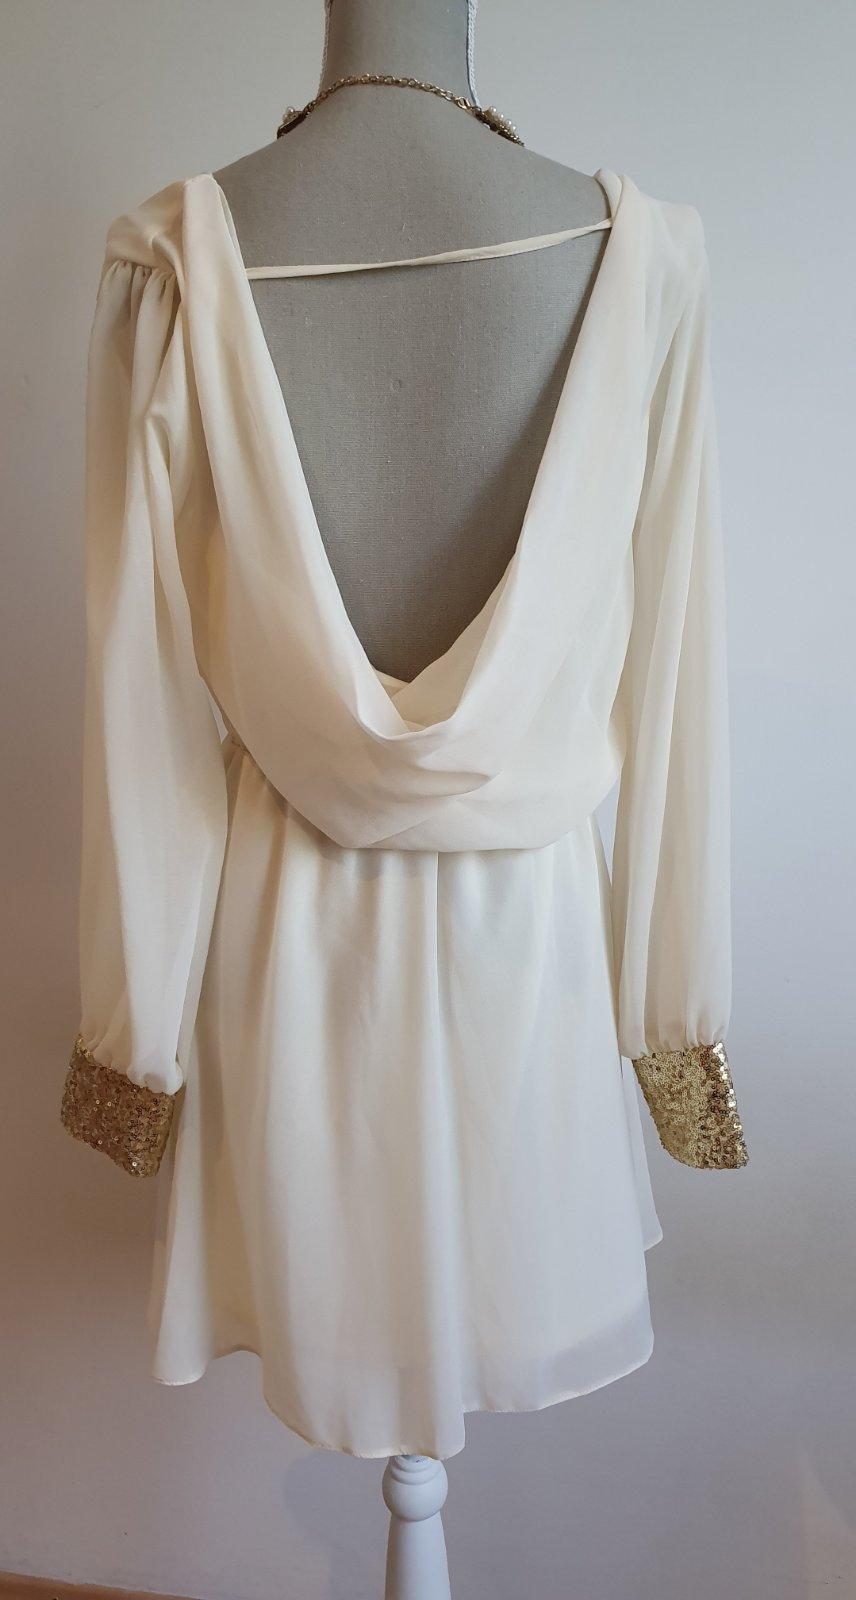 lahulinké šaty Asos - Obrázok č. 3